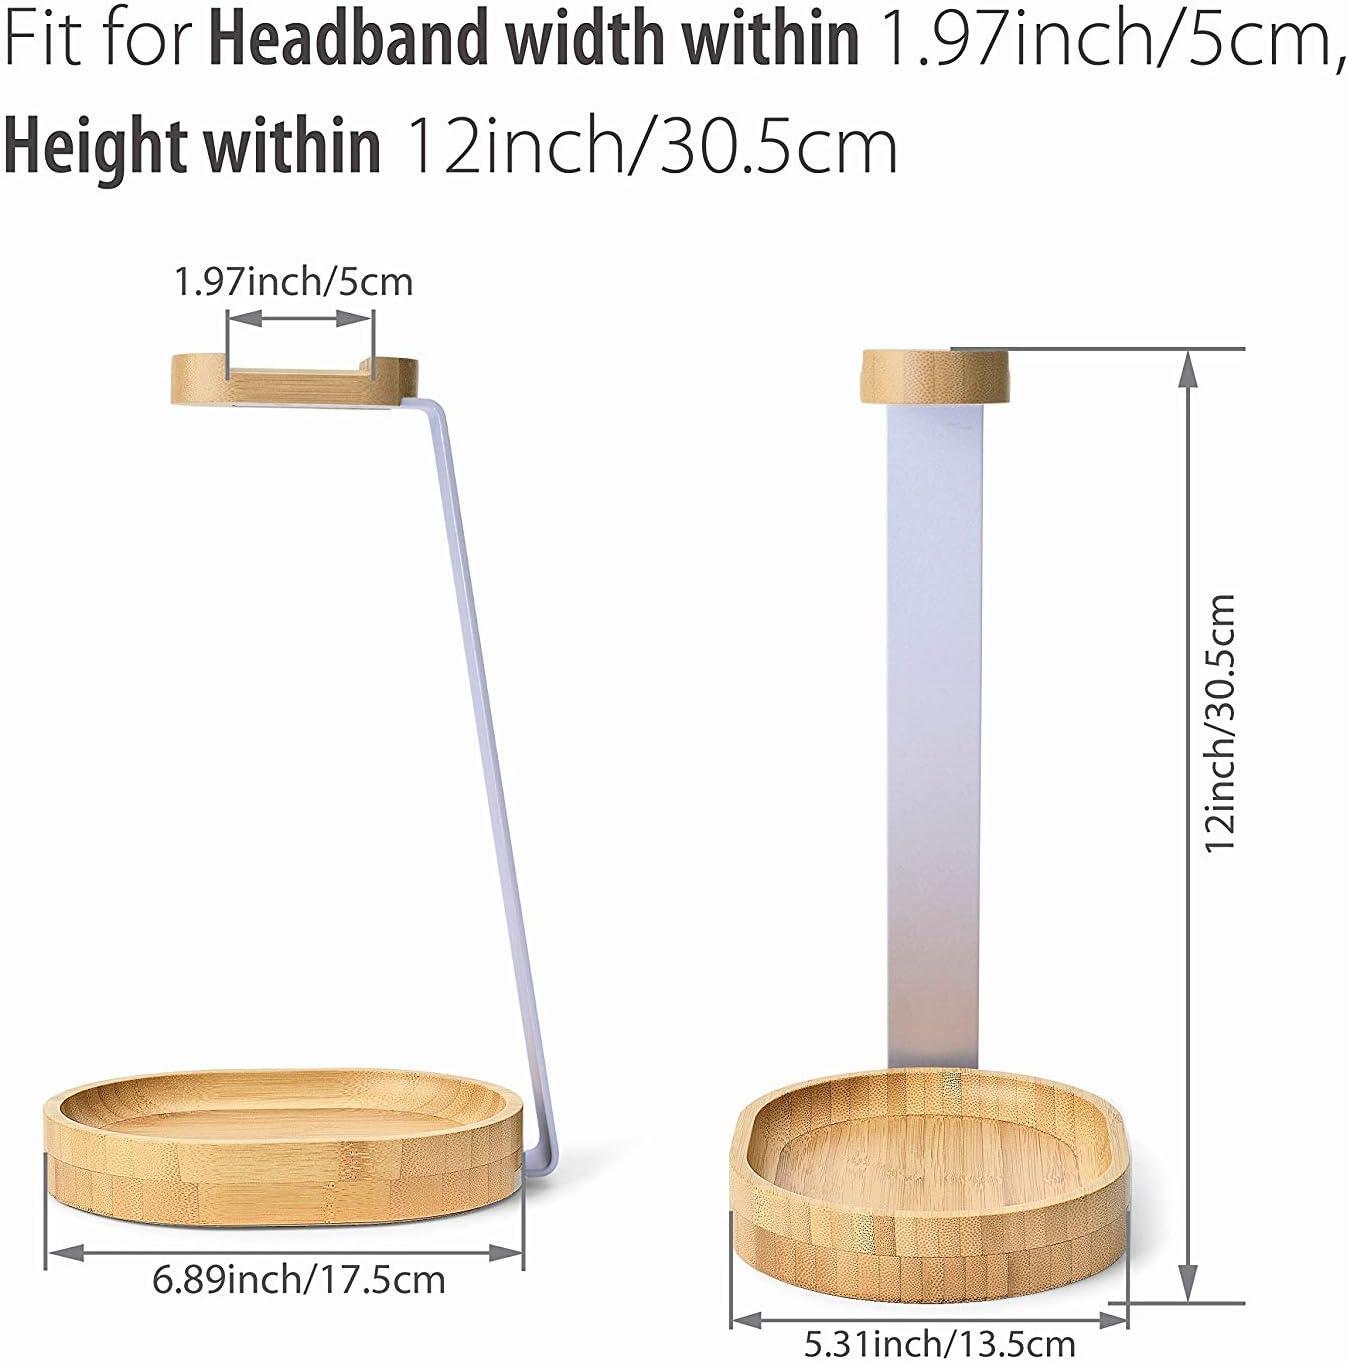 Avantree Universal Wooden /& Aluminum Headphone Stand Hanger with Cable Holder TR902 Bose Jabra Gaming Headphones Display AKG Shure JBL Sturdy Desk Headset Mount Rack for Sony